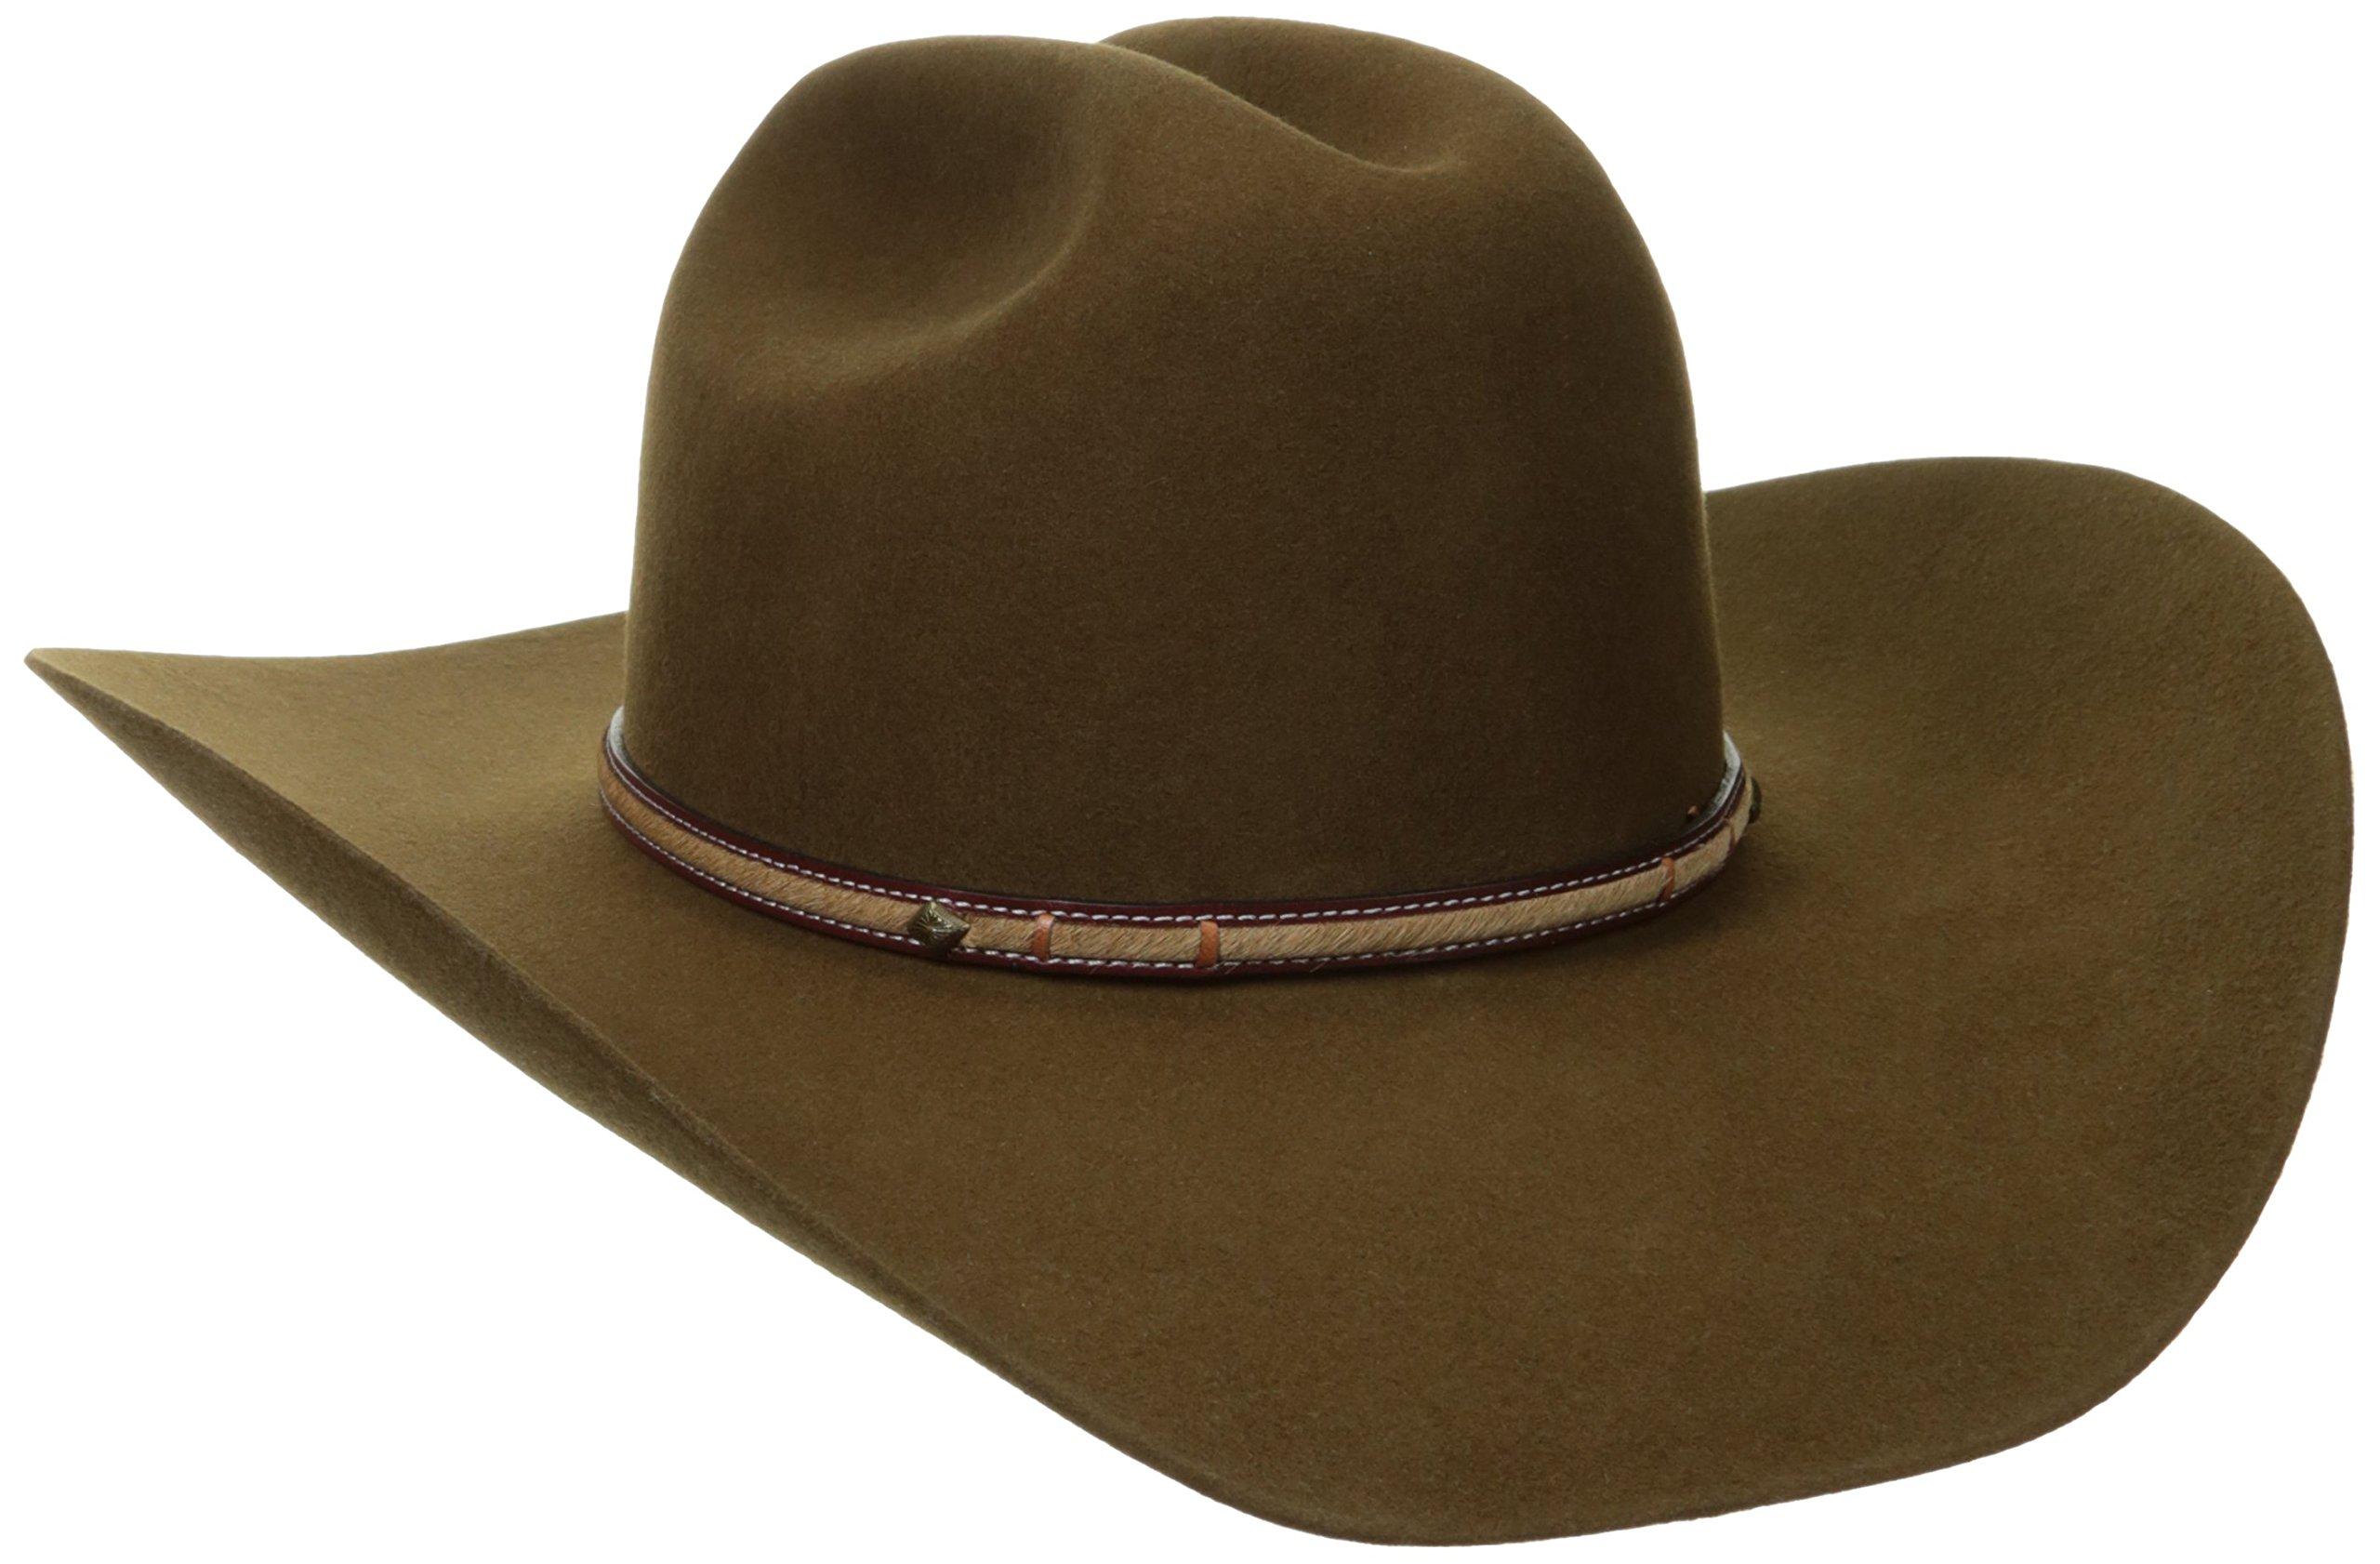 Stetson Men's Powder River 4X Buffalo Felt Cowboy Hat Mink 7 1/2